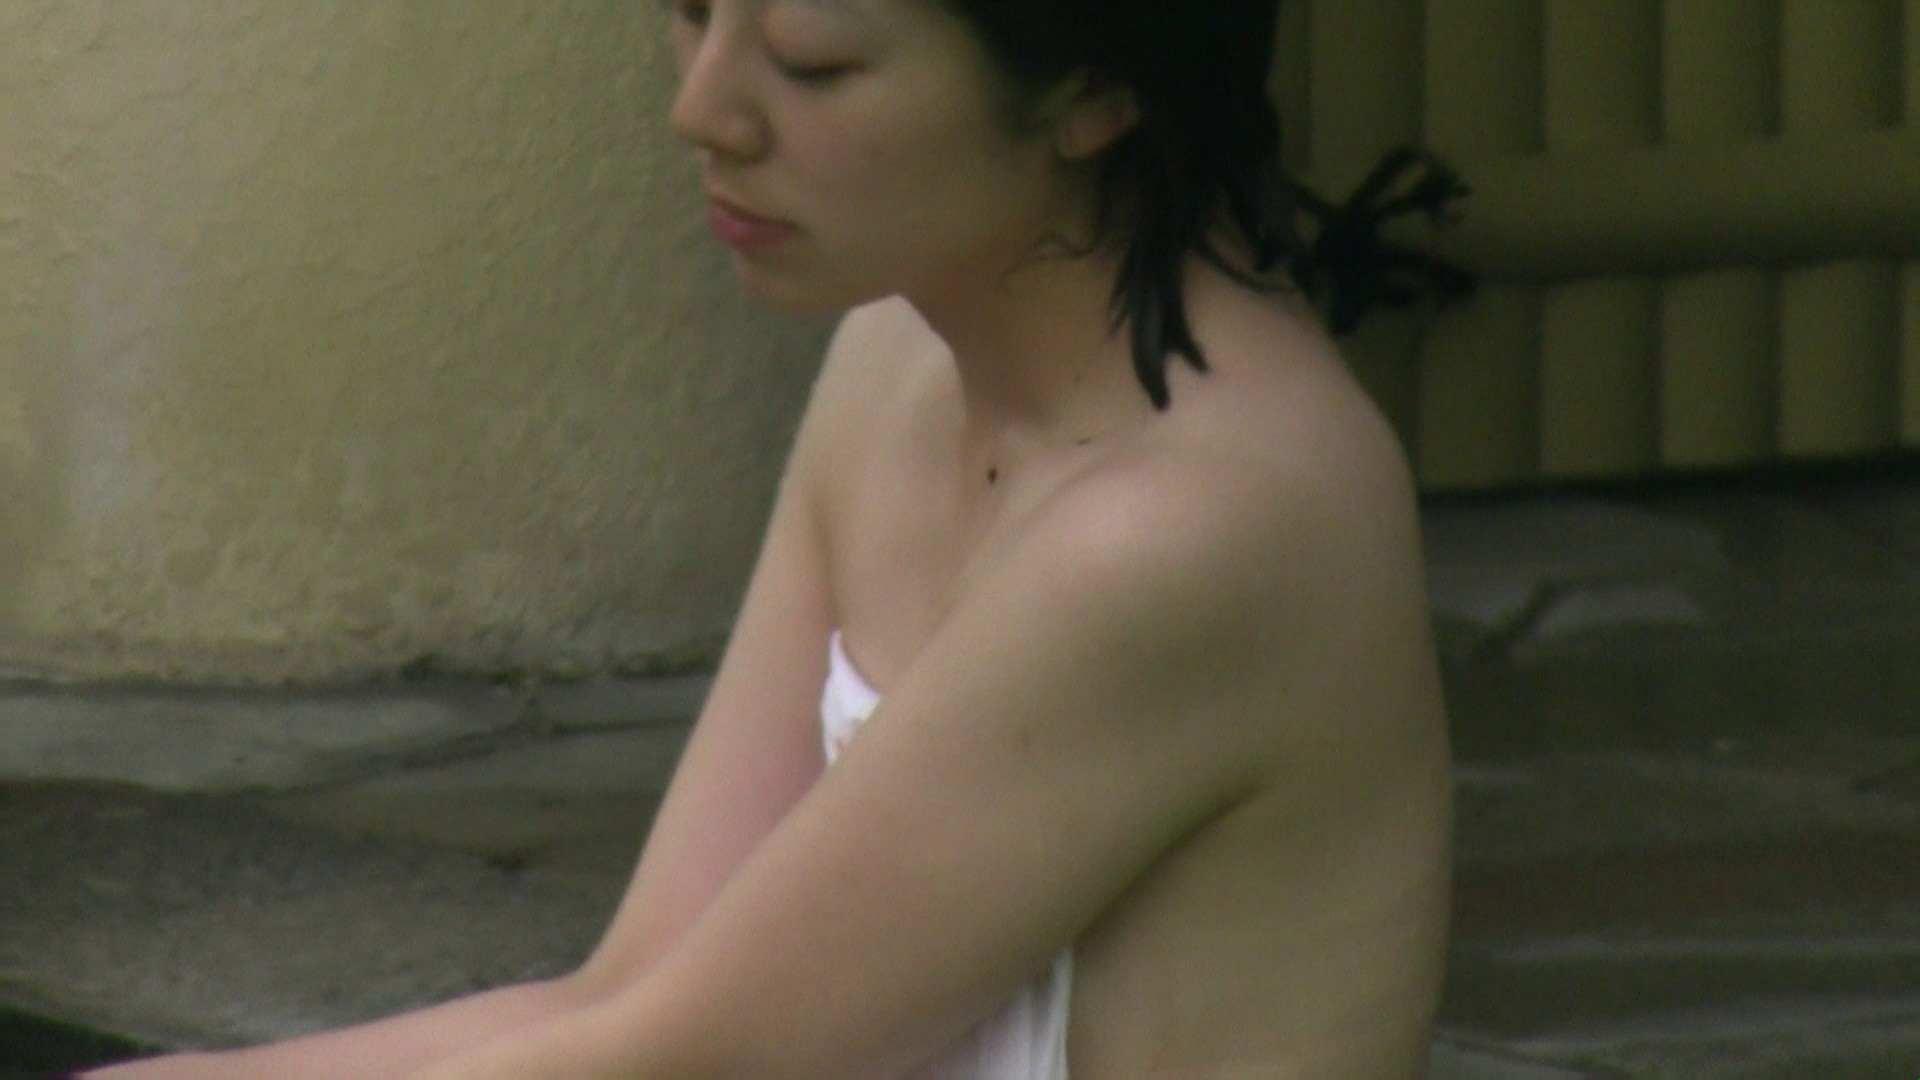 Aquaな露天風呂Vol.04 露天 オメコ無修正動画無料 84pic 49